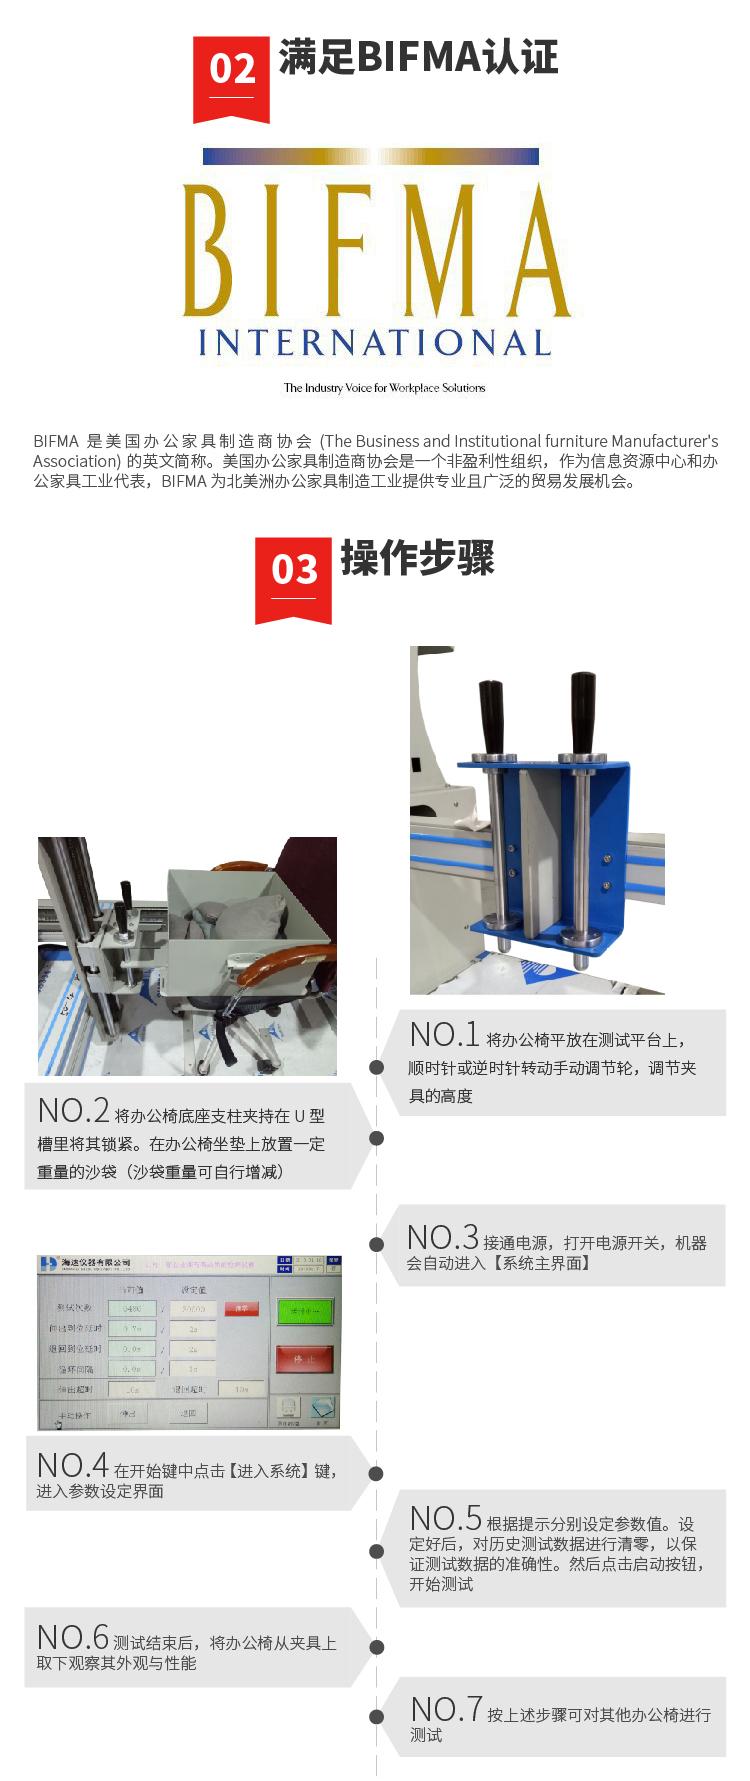 HD-腳輪、椅子底座耐久試驗機-03.jpg